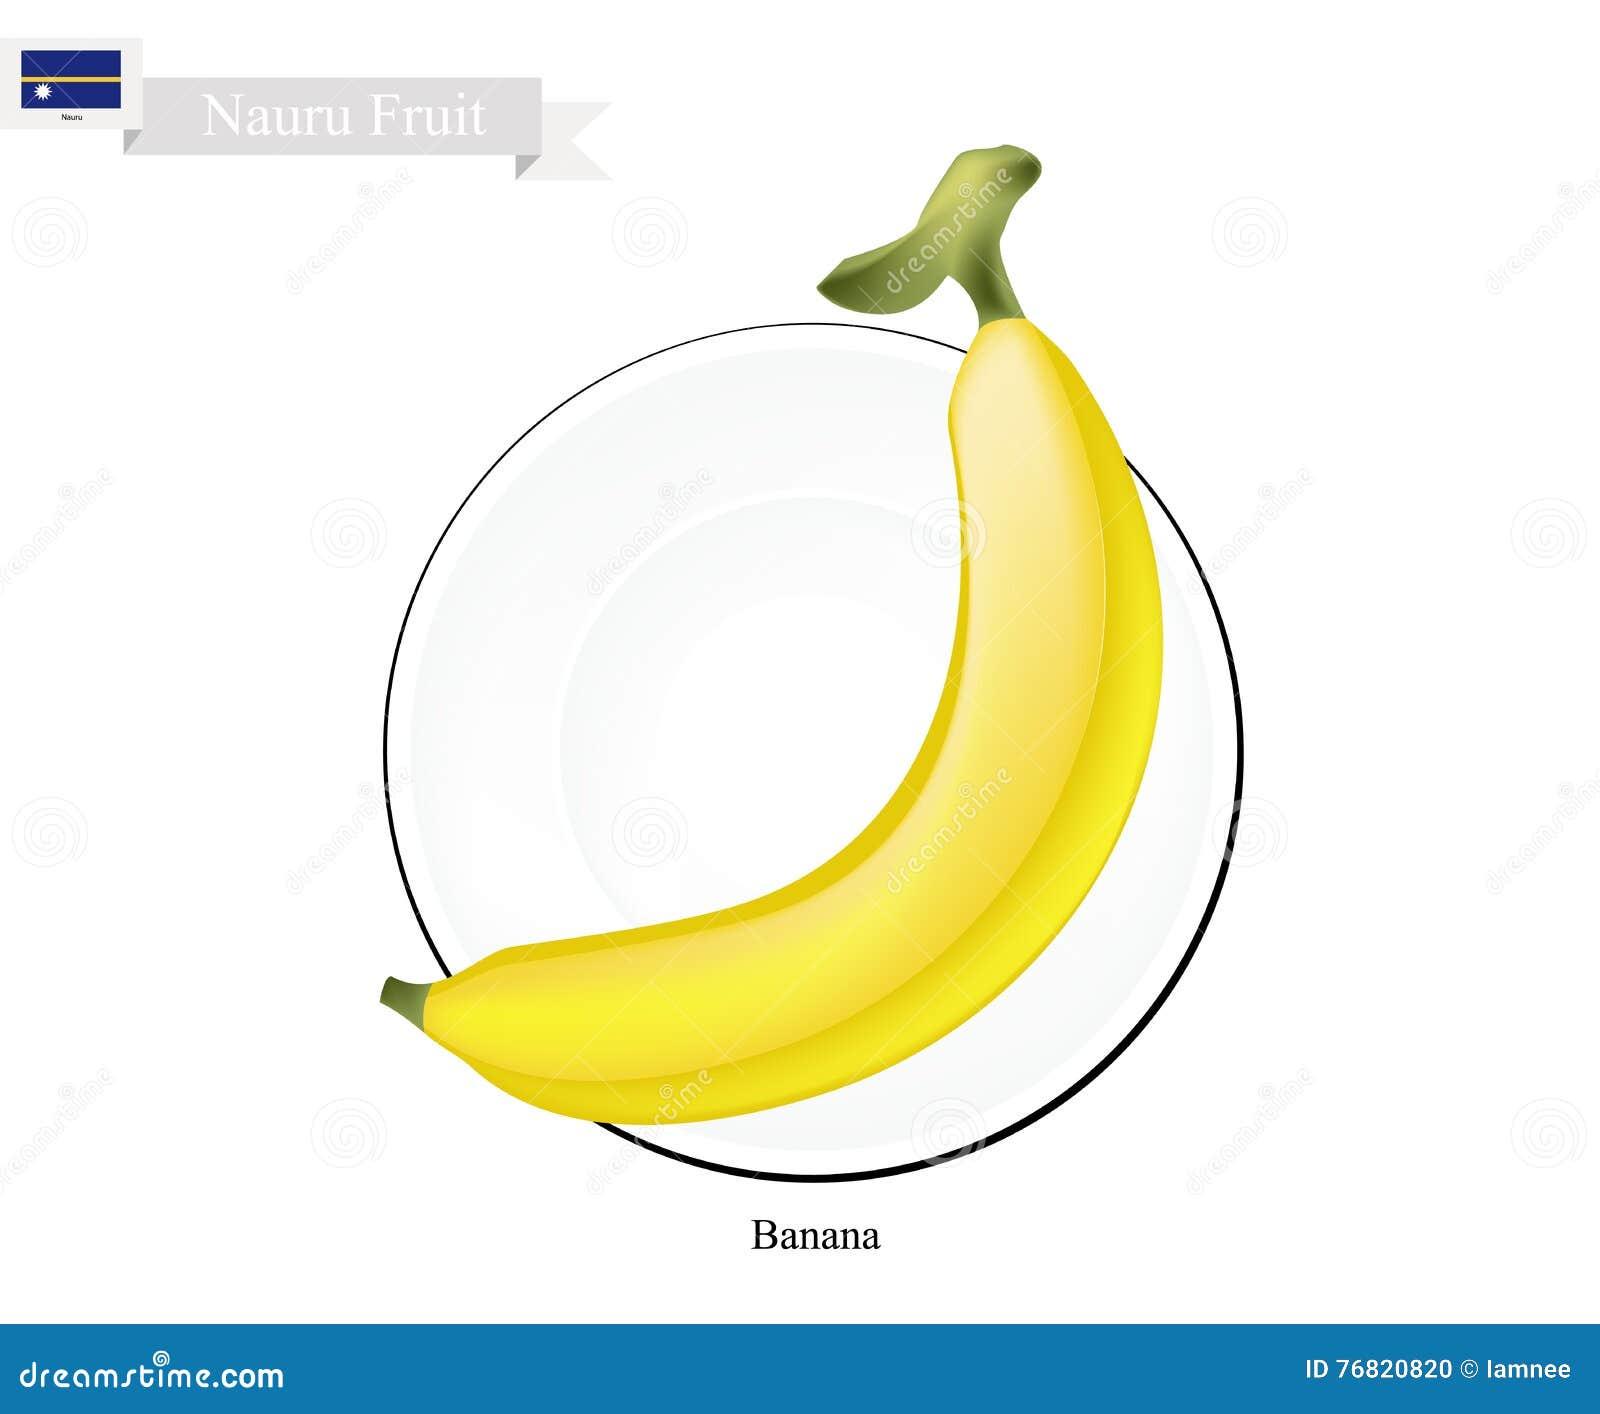 Banana dourada, frutos populares em Nauru